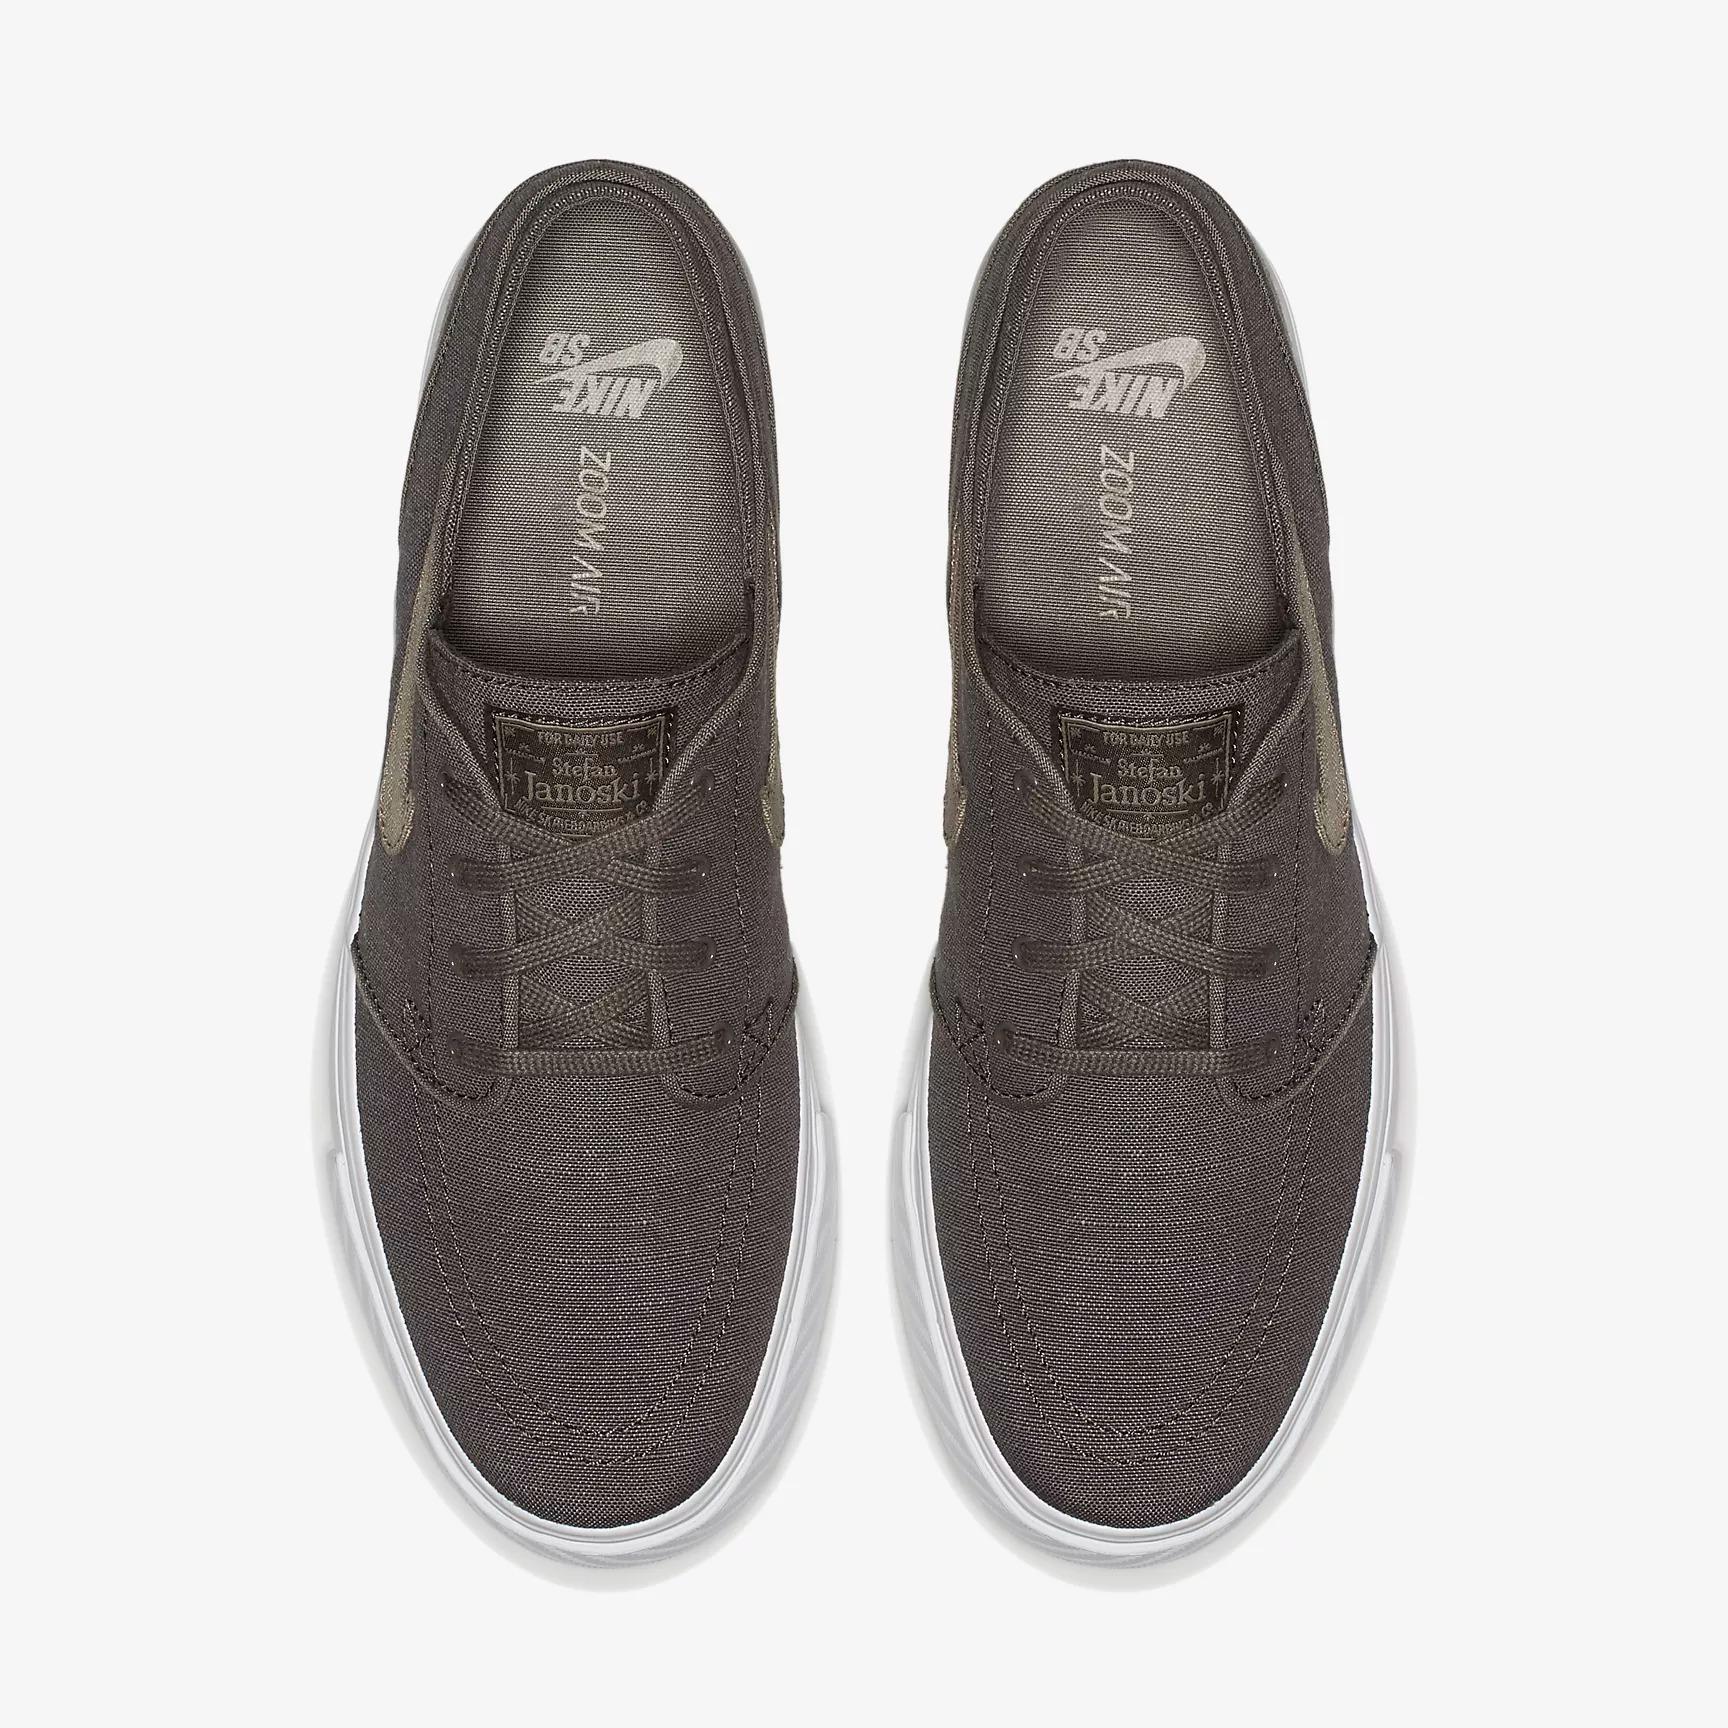 the latest b04ff aa6e6 Nike SB Zoom Stefan Janoski Canvas Deconstructed Sneakers - SPORT ...